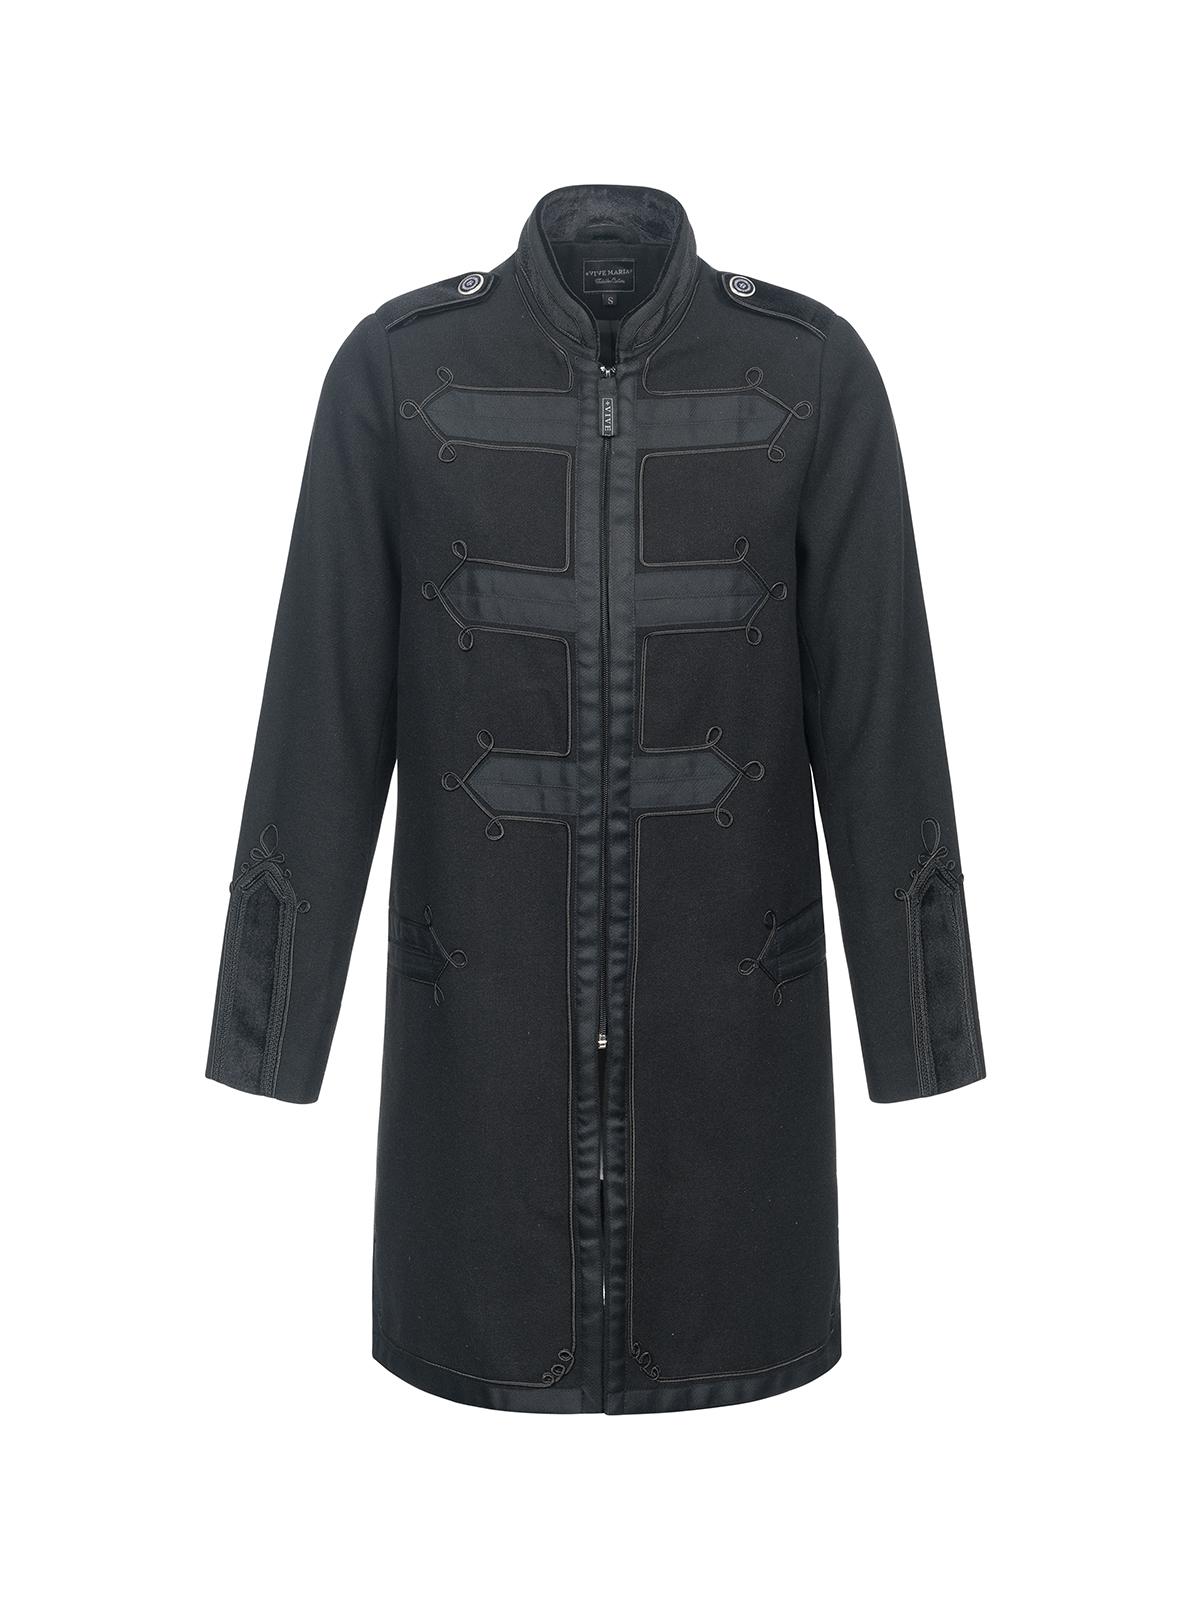 Jacken - Vive Maria Chic Classic Damen Mantel schwarz – Größe L  - Onlineshop NAPO Shop